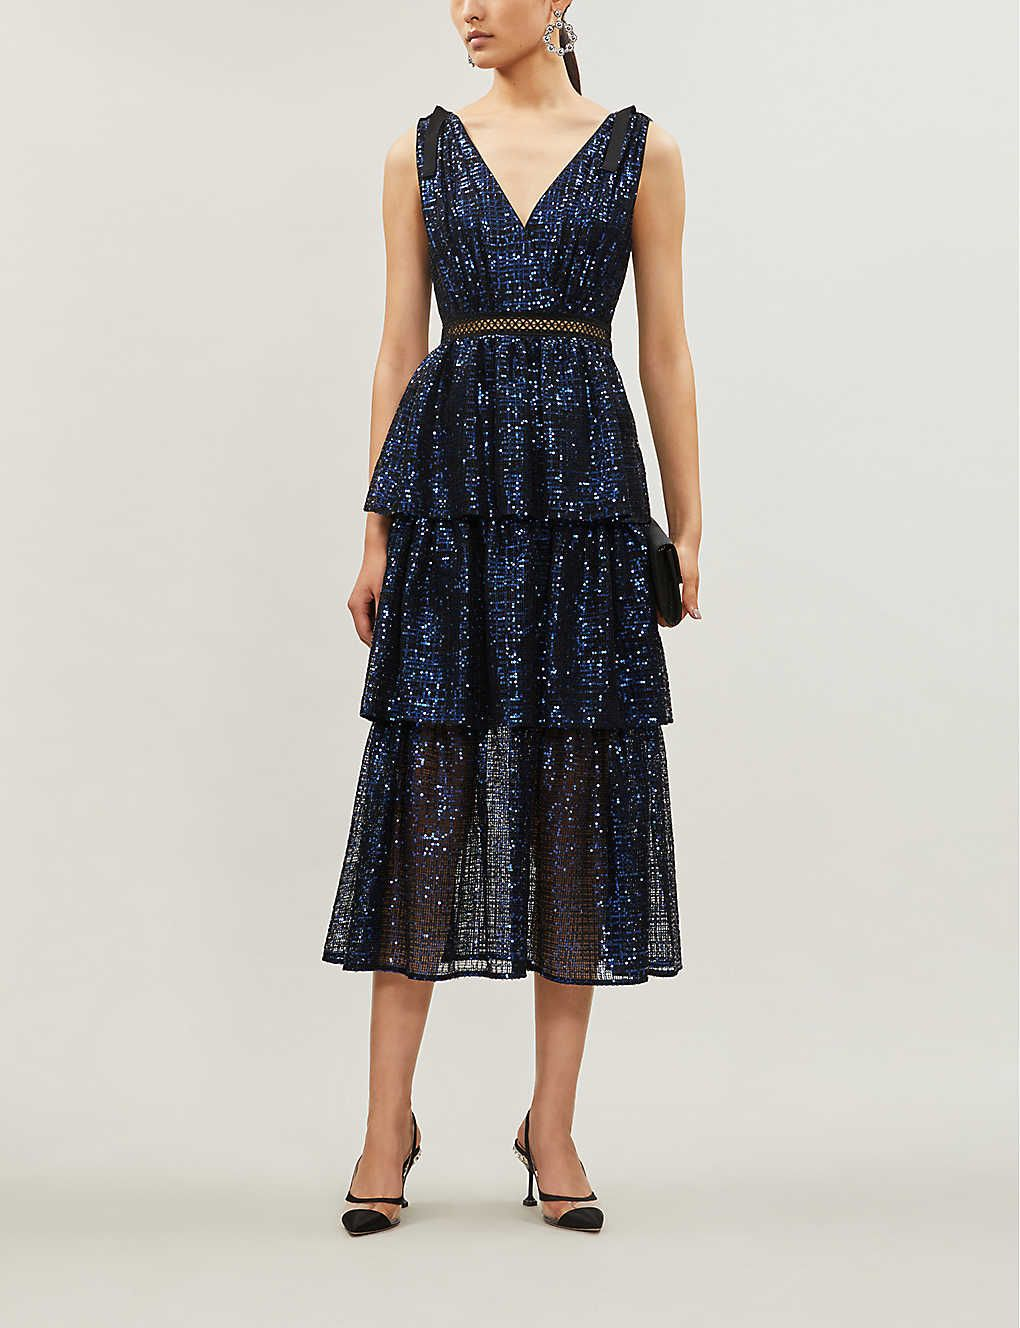 prevalent enjoy discount price so cheap 49 best winter wedding guest dresses - Fashion Editor picks